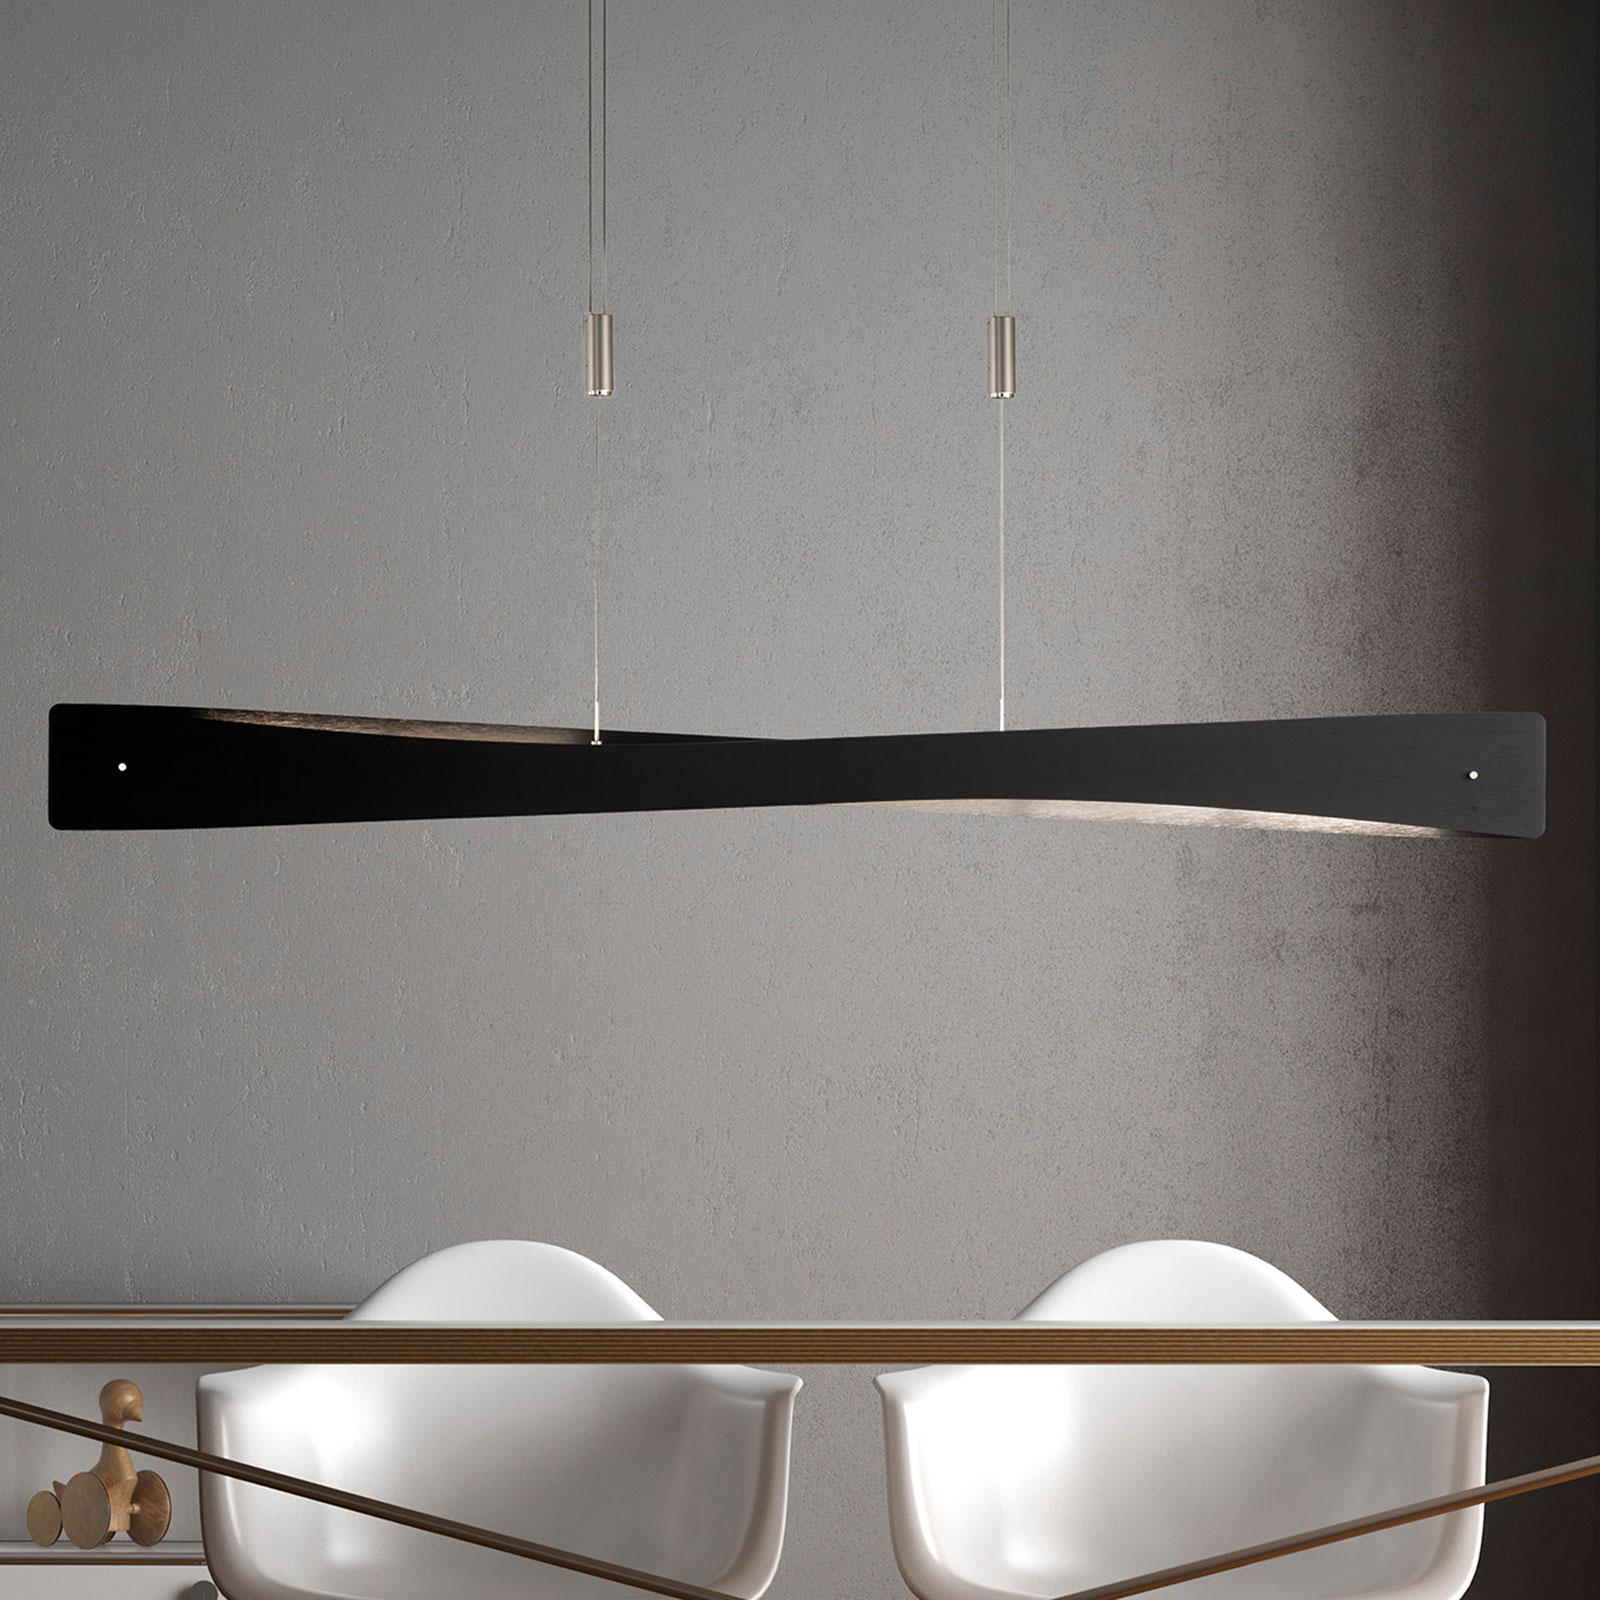 Lucande Lian LED hanglamp, zwart, aluminium